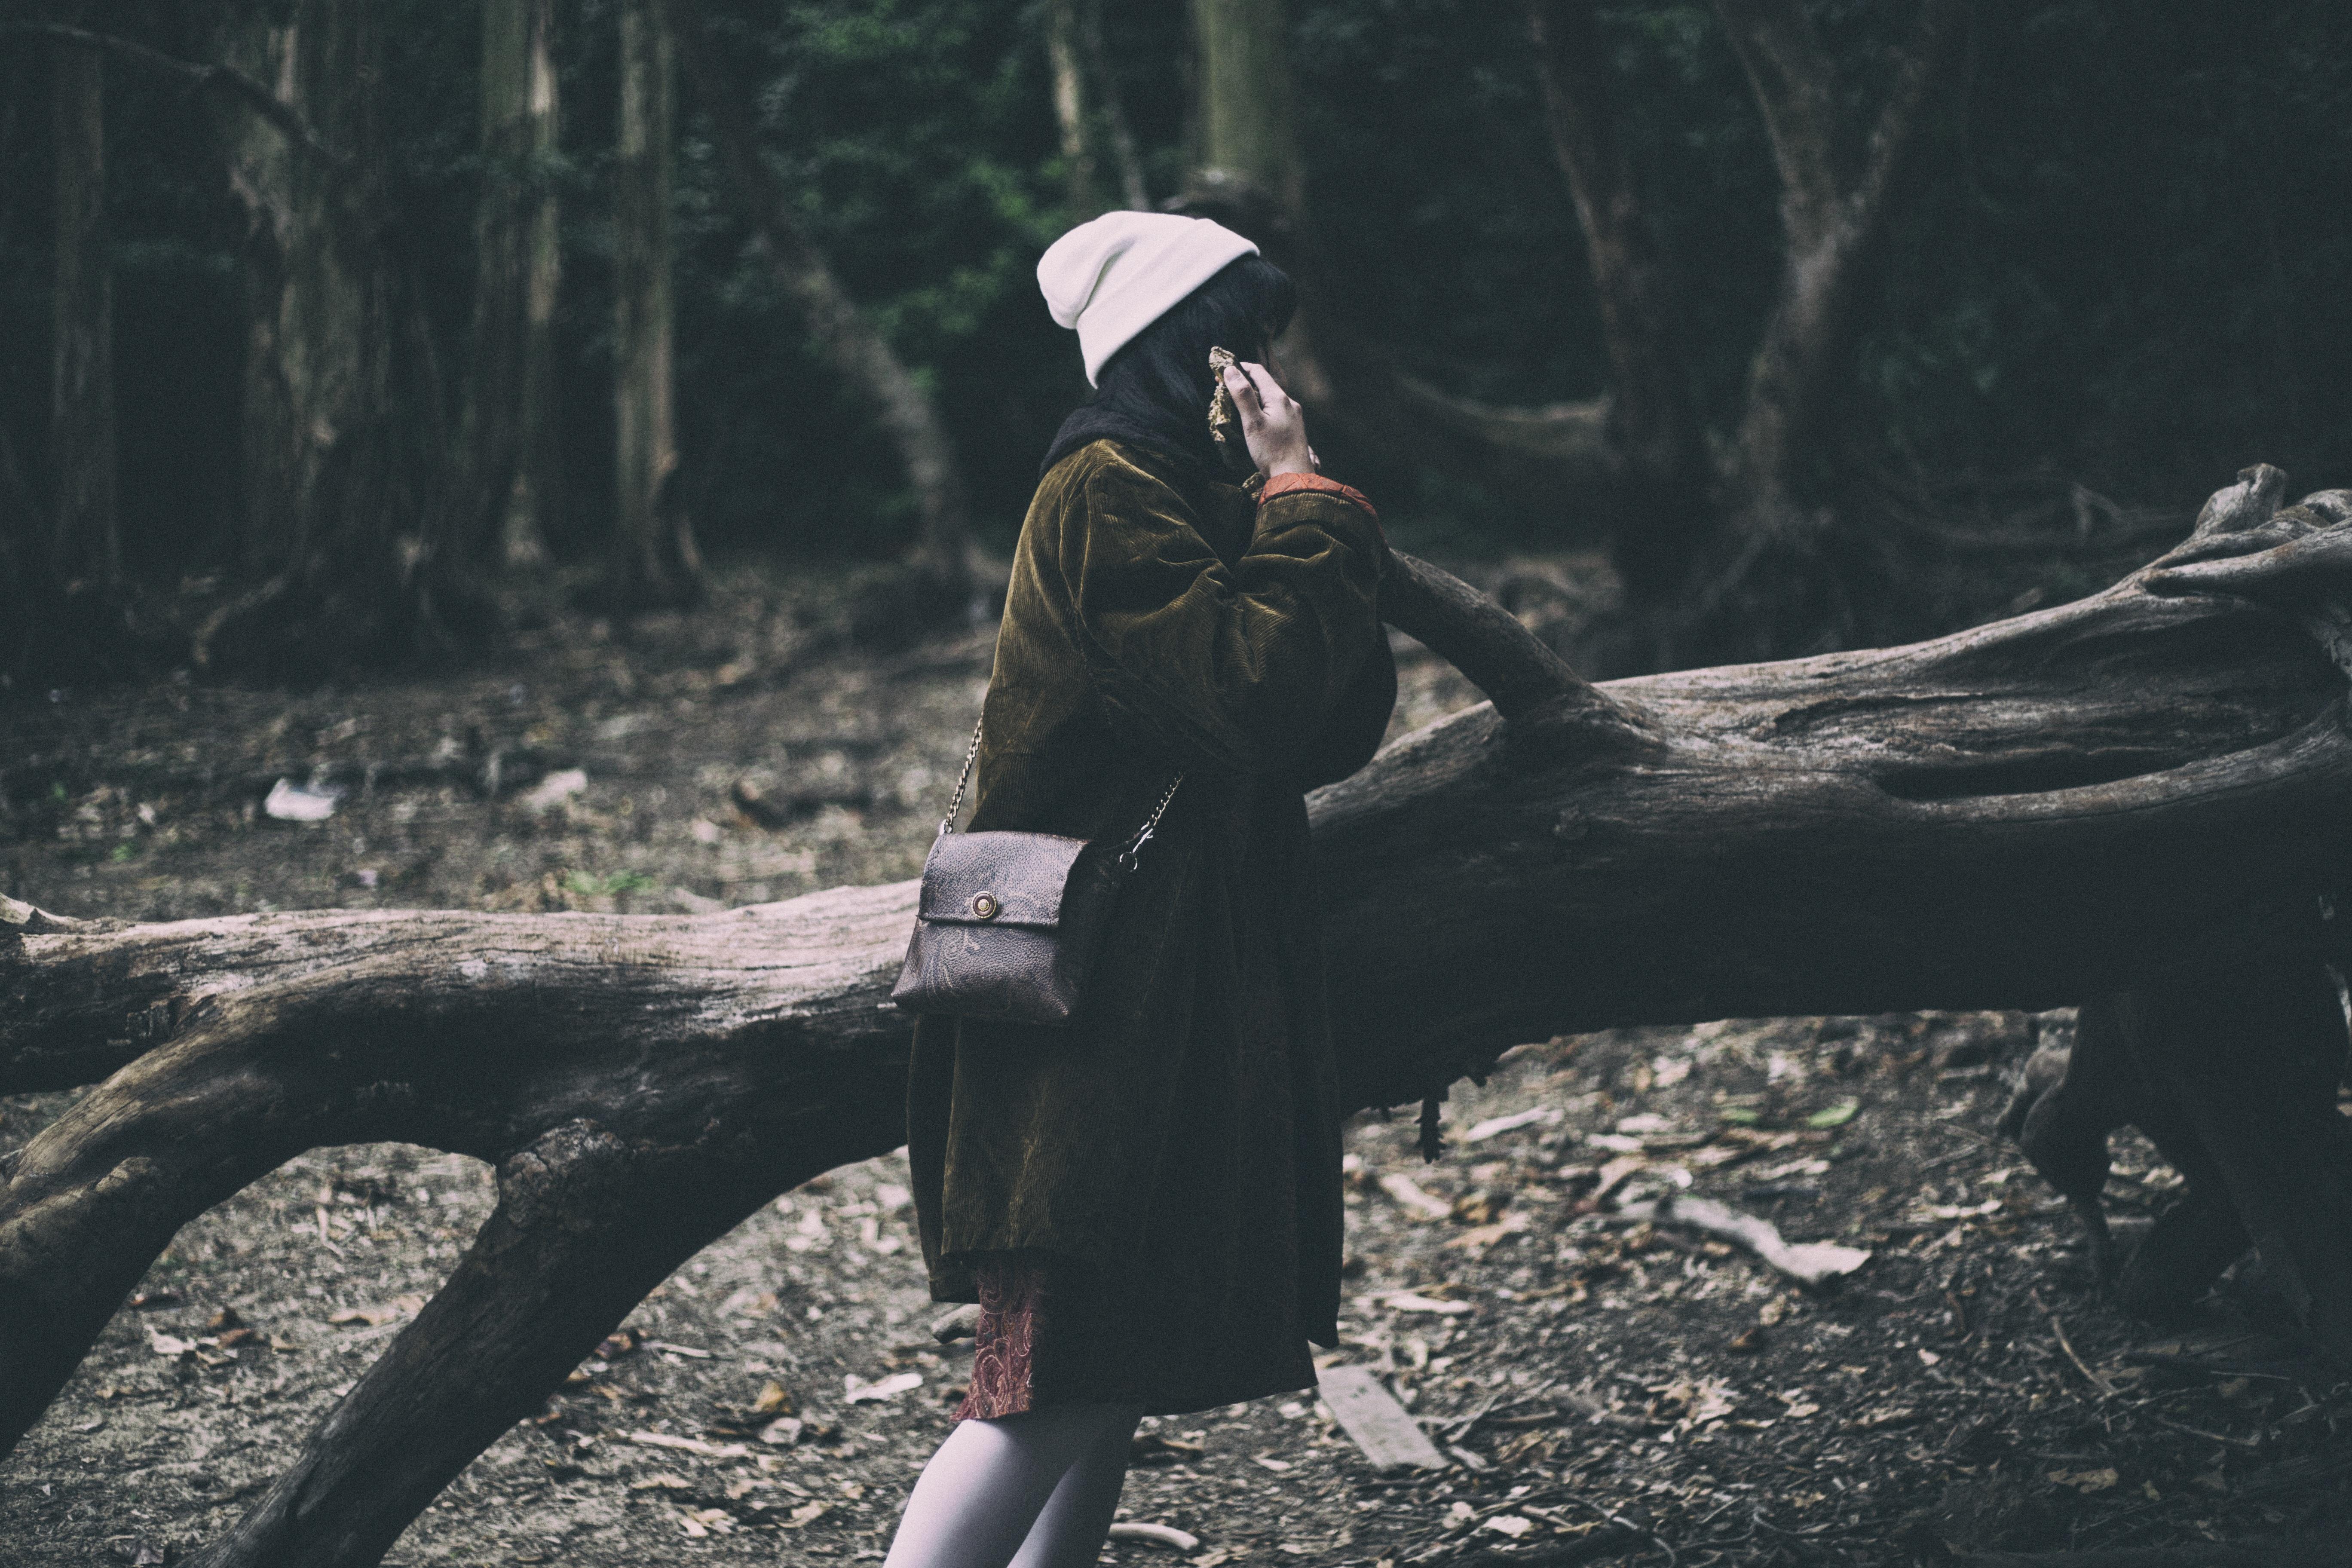 Most Inspiring Wallpaper Forest Girl - forest-black-winter-gloomy-spring-tree-lonely-girl-darkness-549908  Image_557511 .jpg